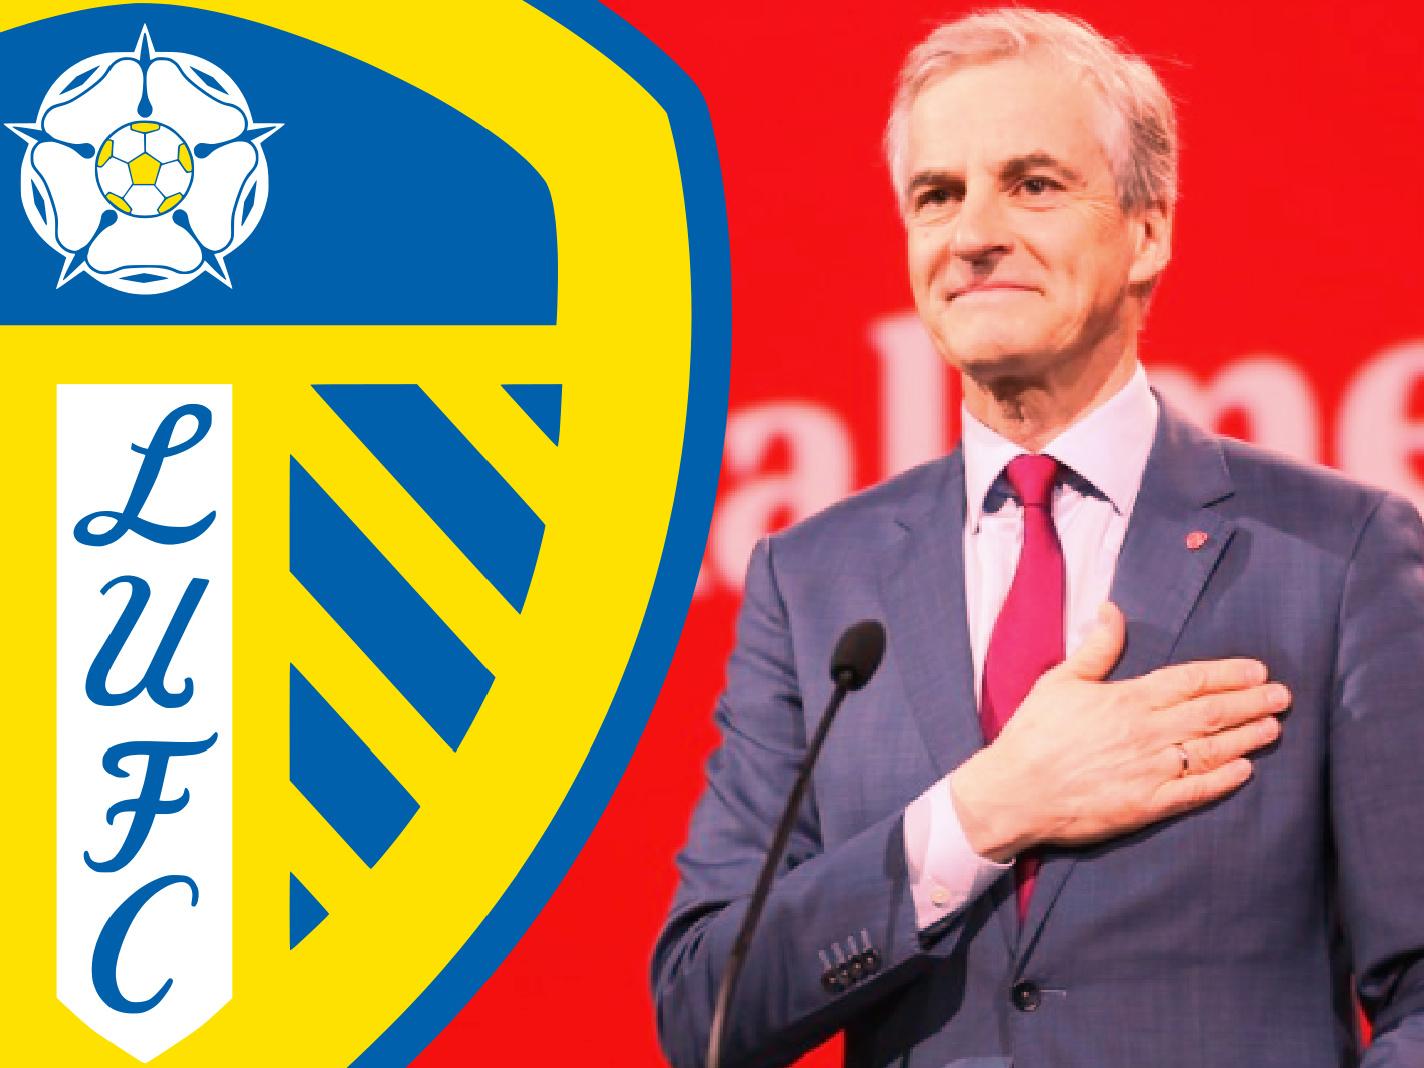 Leeds United logo along with a photo of Jonas Gahr Støre